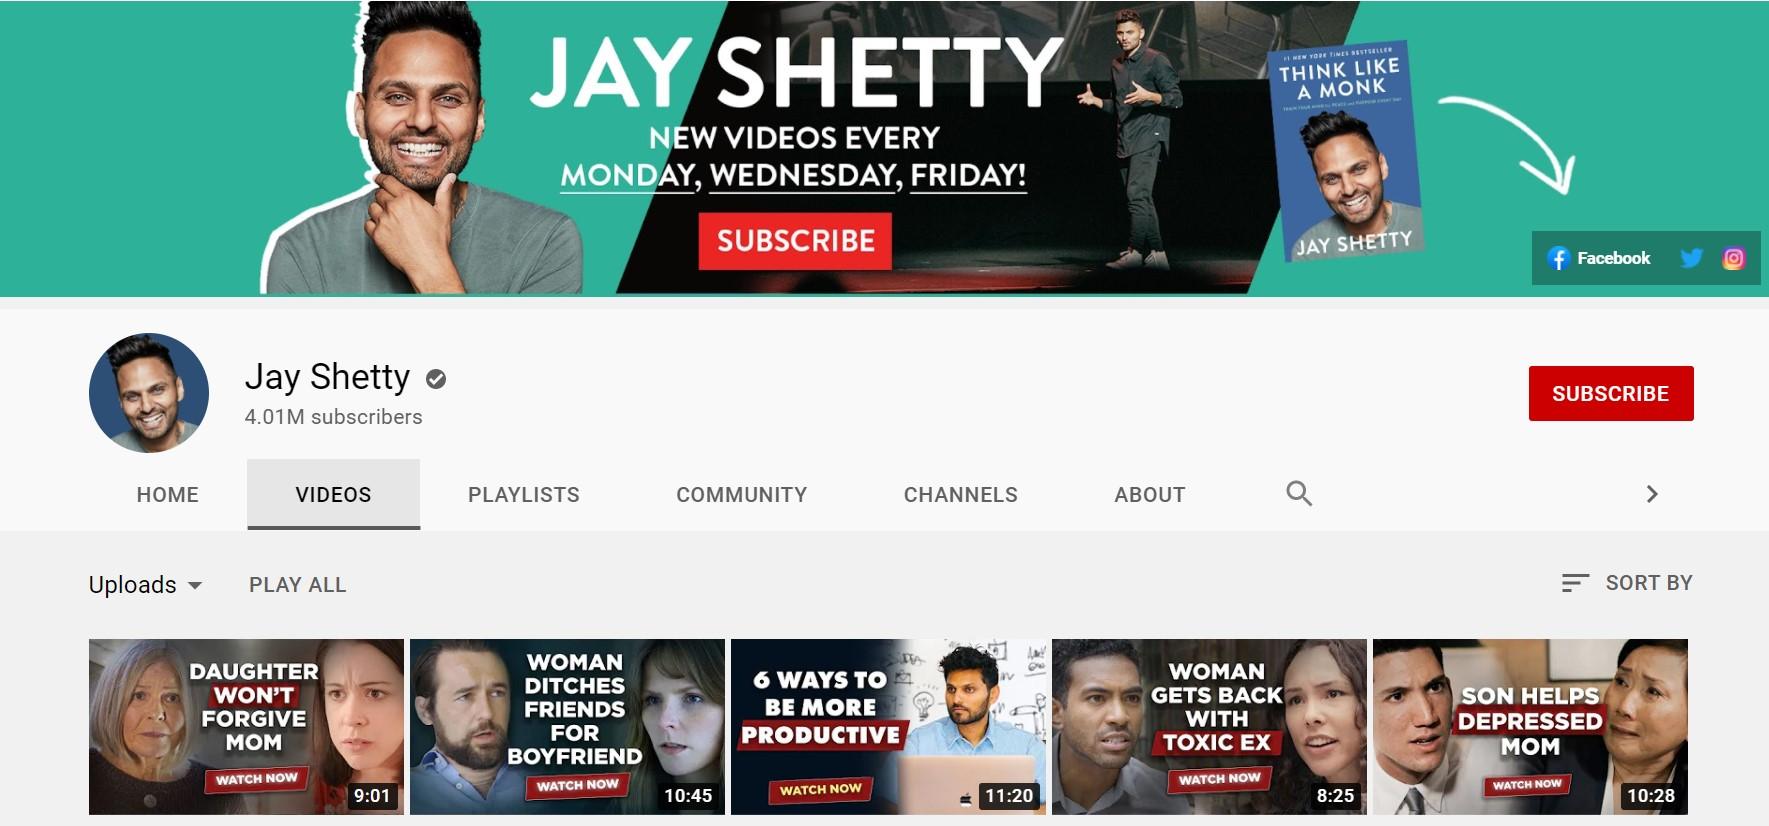 Jay Shetty Youtube